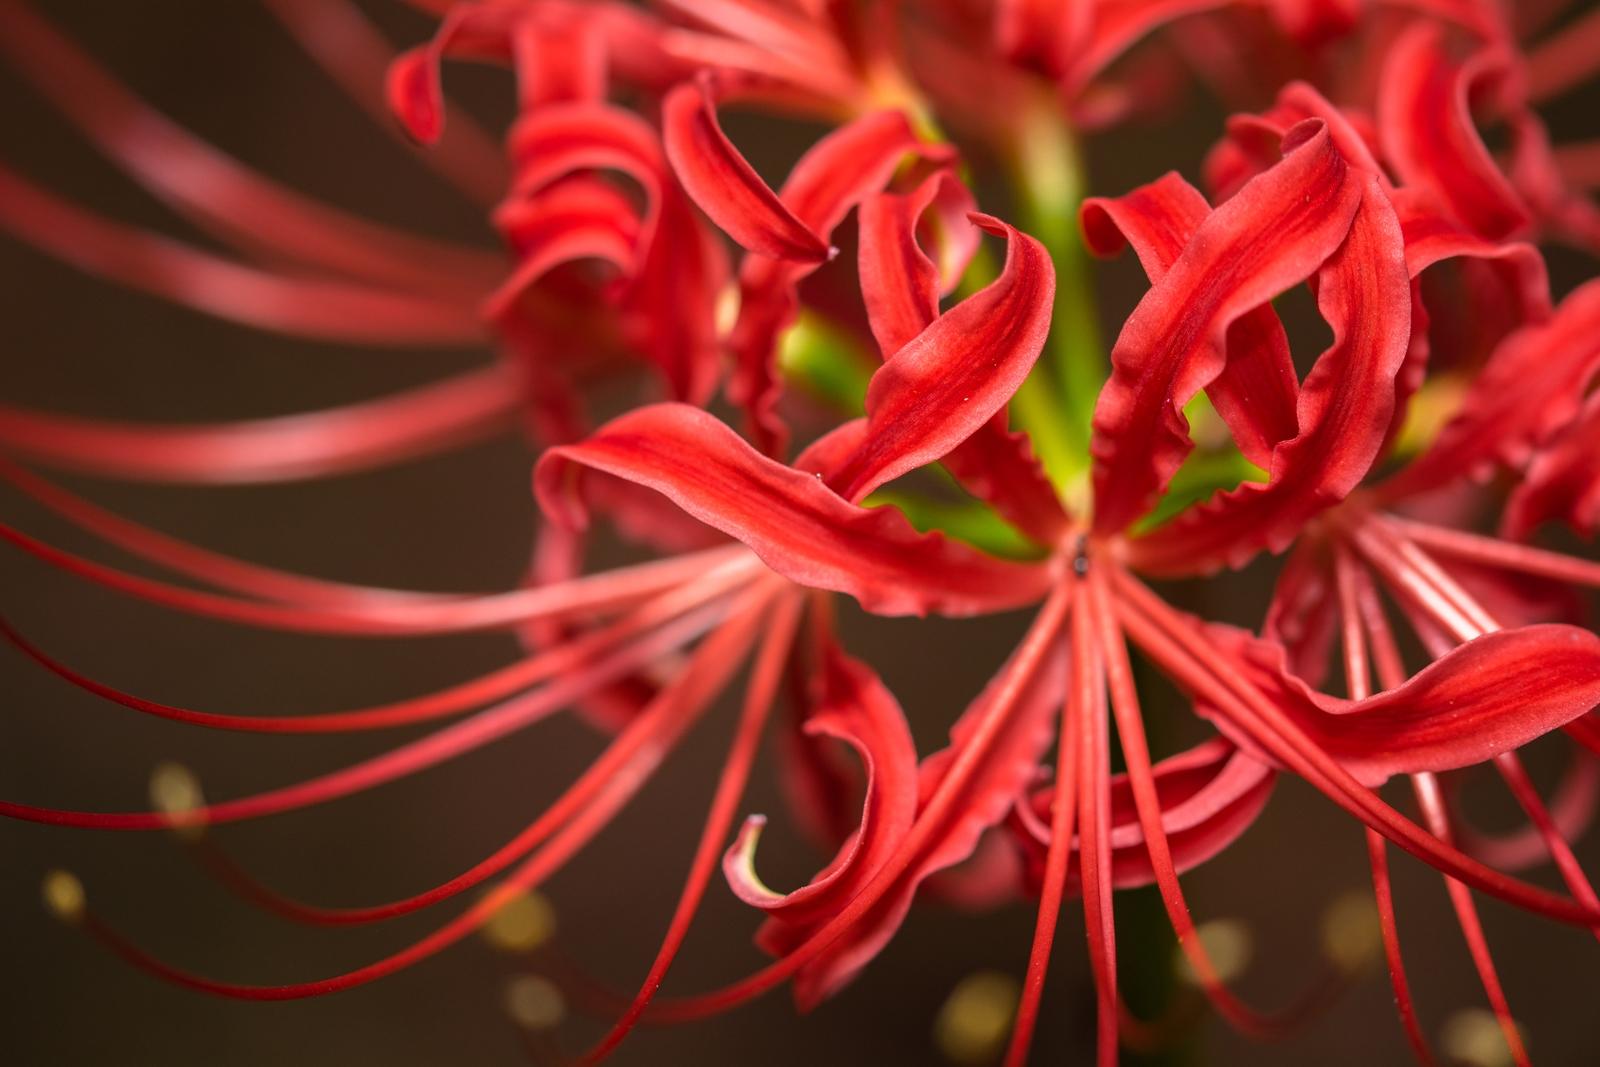 Photo: 燃えるように赤を咲かせて Blooming flamingly.  林の中でひっそりと 静かに灯る炎のように ふつふつと魅せる 目が覚めるような鮮烈な赤 気高き赤の花  Photo of red spider lily. (砧公園の彼岸花) Nikon D7100 MACRO 105mm F2.8 EX DG OS HSM #cooljapan #100tokyo #365cooljapanmay #東京フォト #tokyophoto #GPlusPhotoWalkJapan [ Day138, September 27th ] (3枚追加:Added 3 photo)